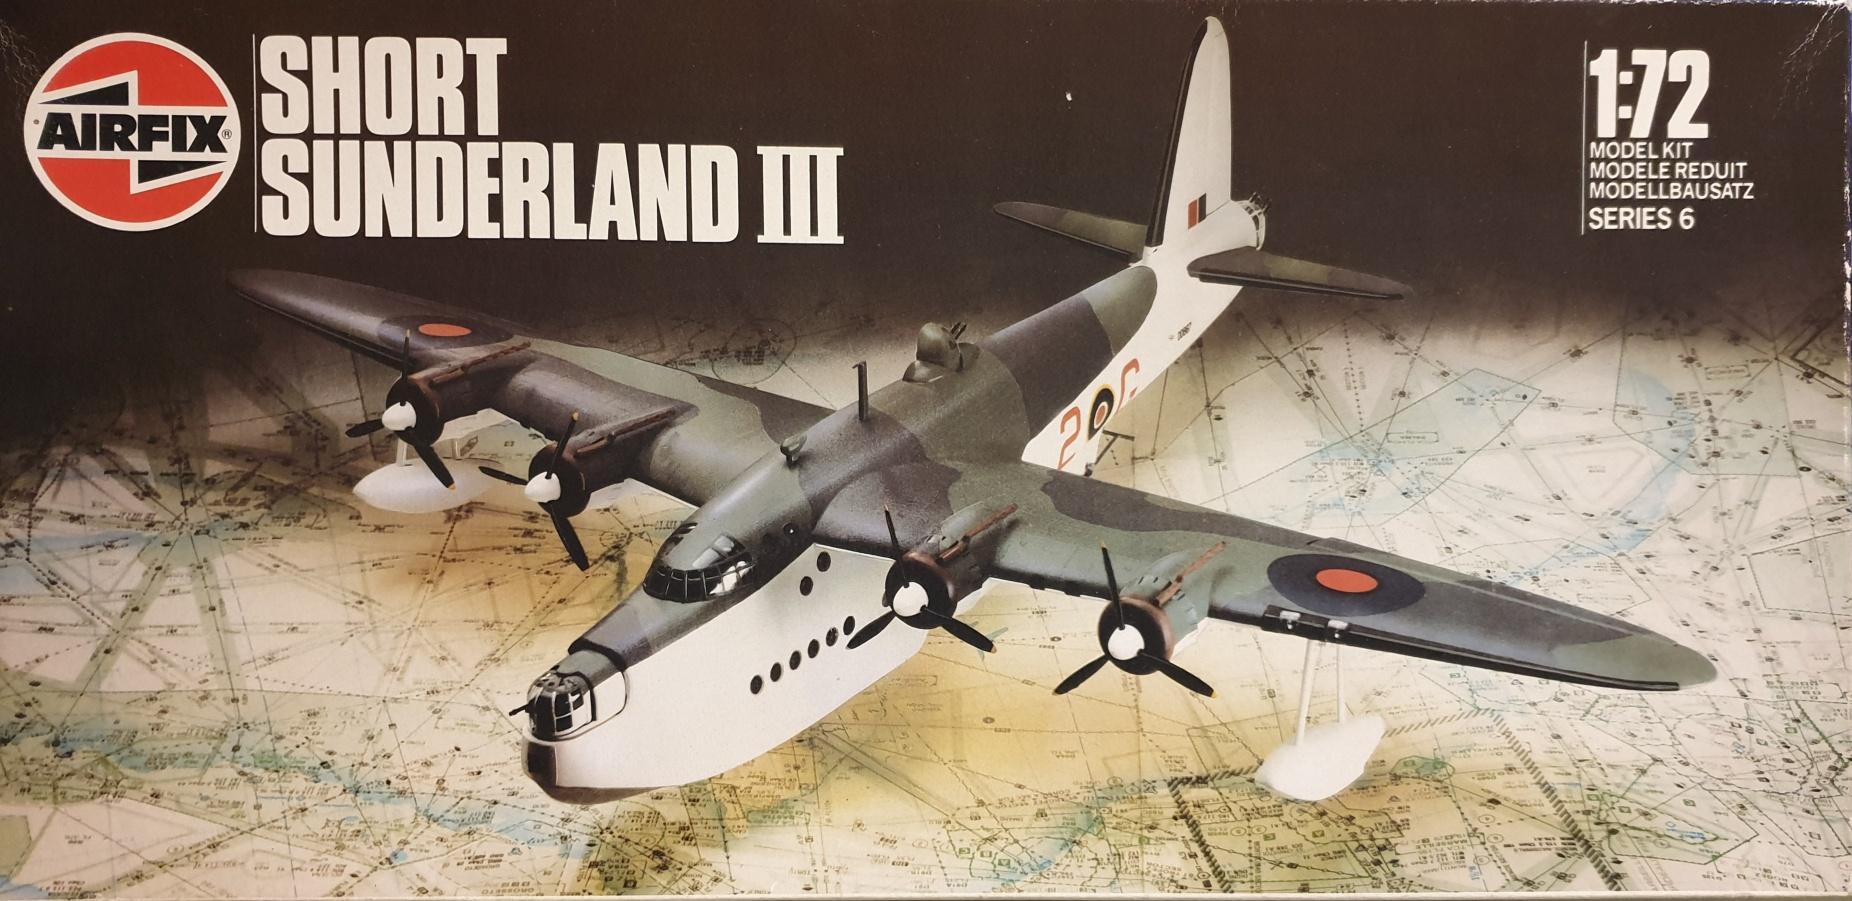 Airfix 06001 Short Sunderland III